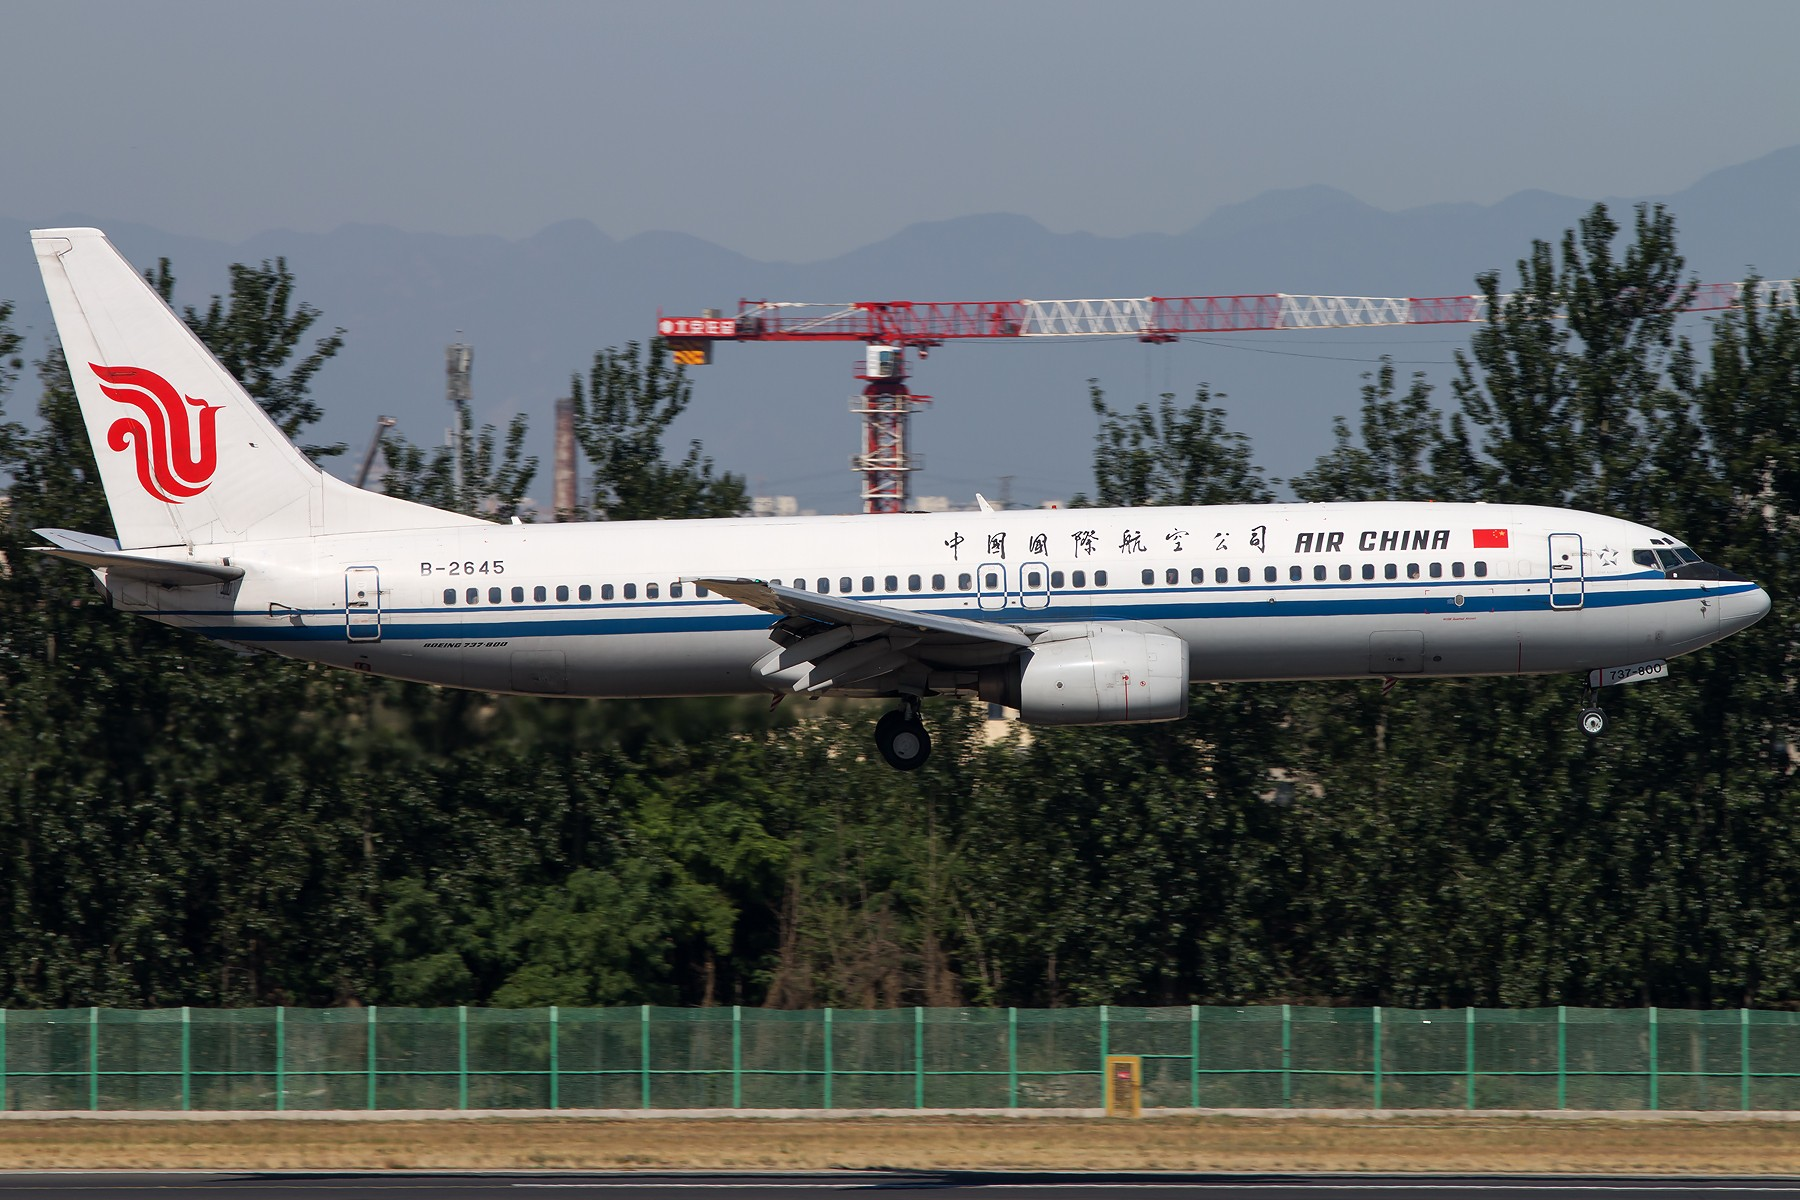 Re:[原创]三大航普通装 1800*1200 [10pics] BOEING 737-800 B-2645 中国北京首都国际机场